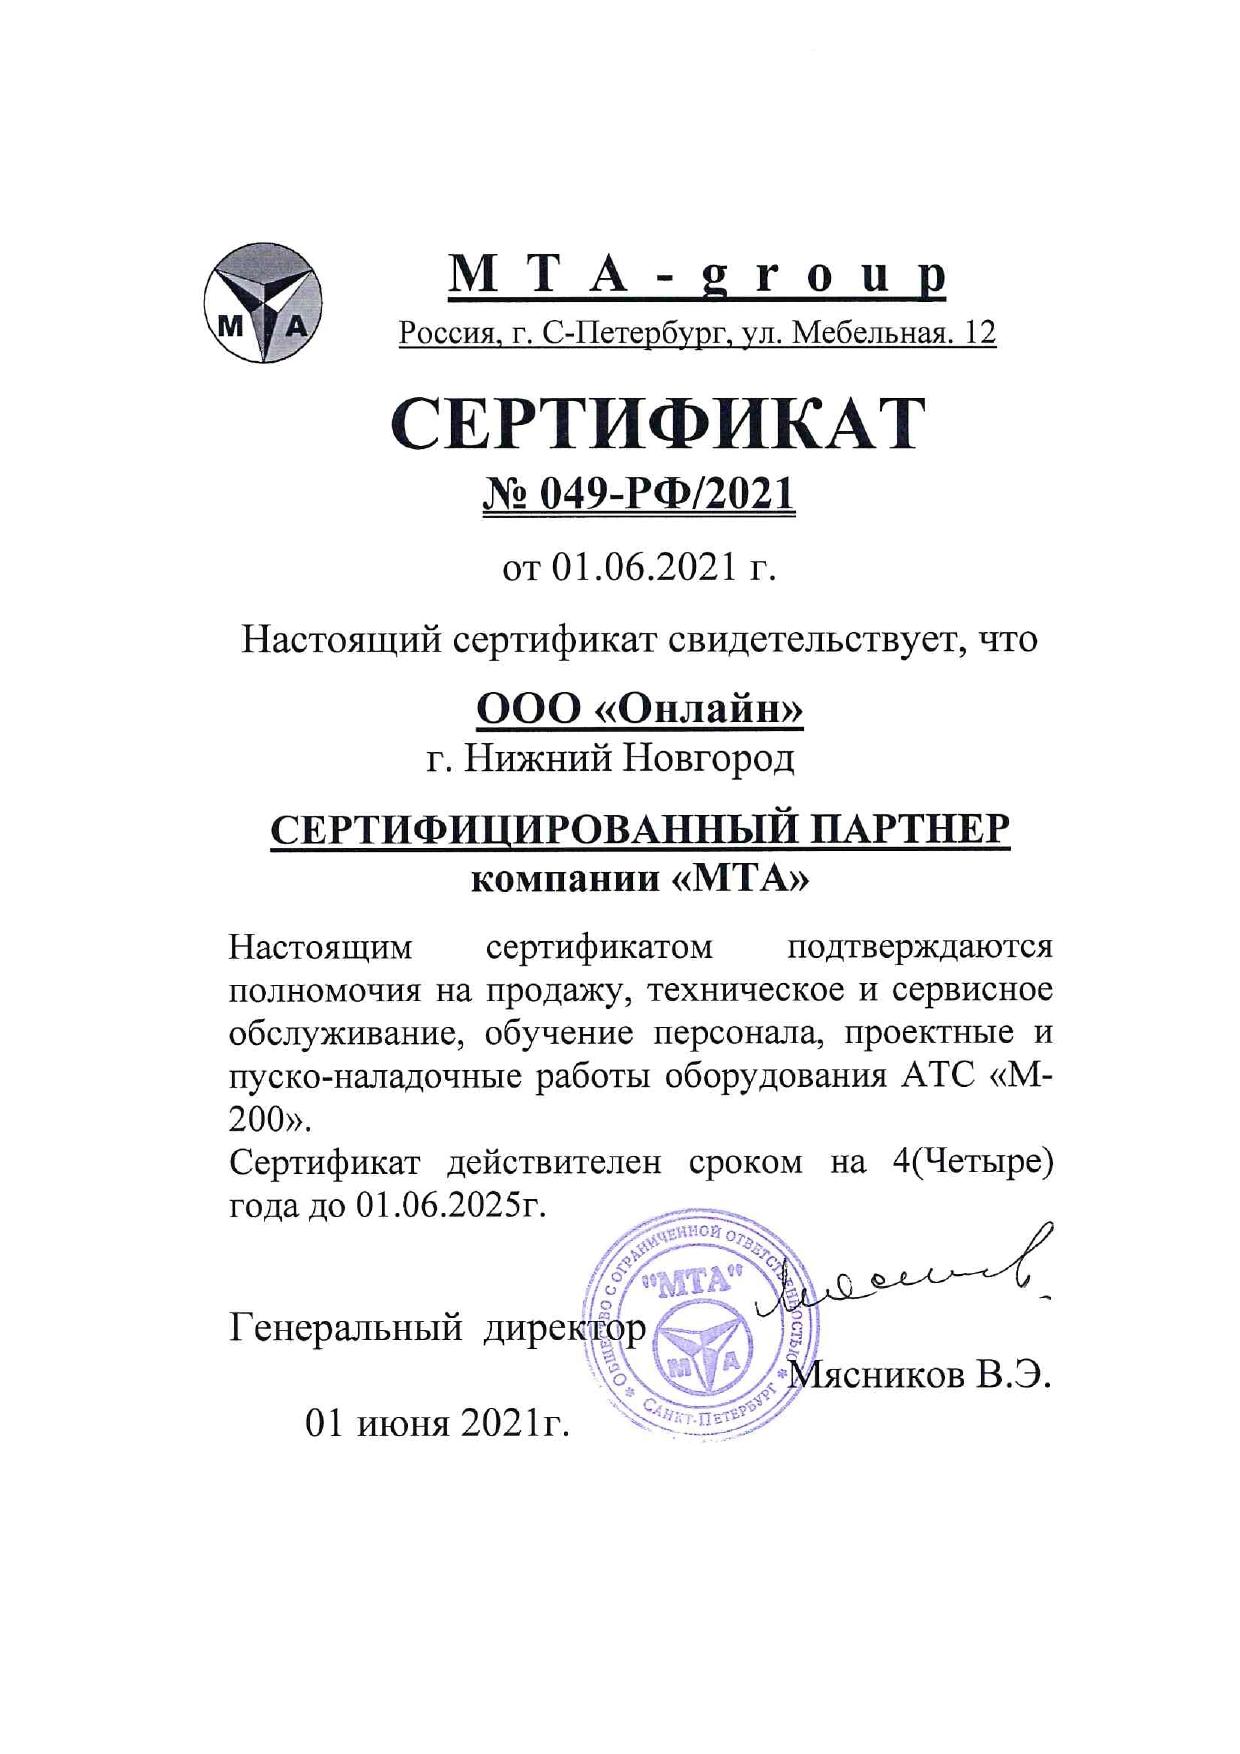 Сертификат МТА до 01.06.2025